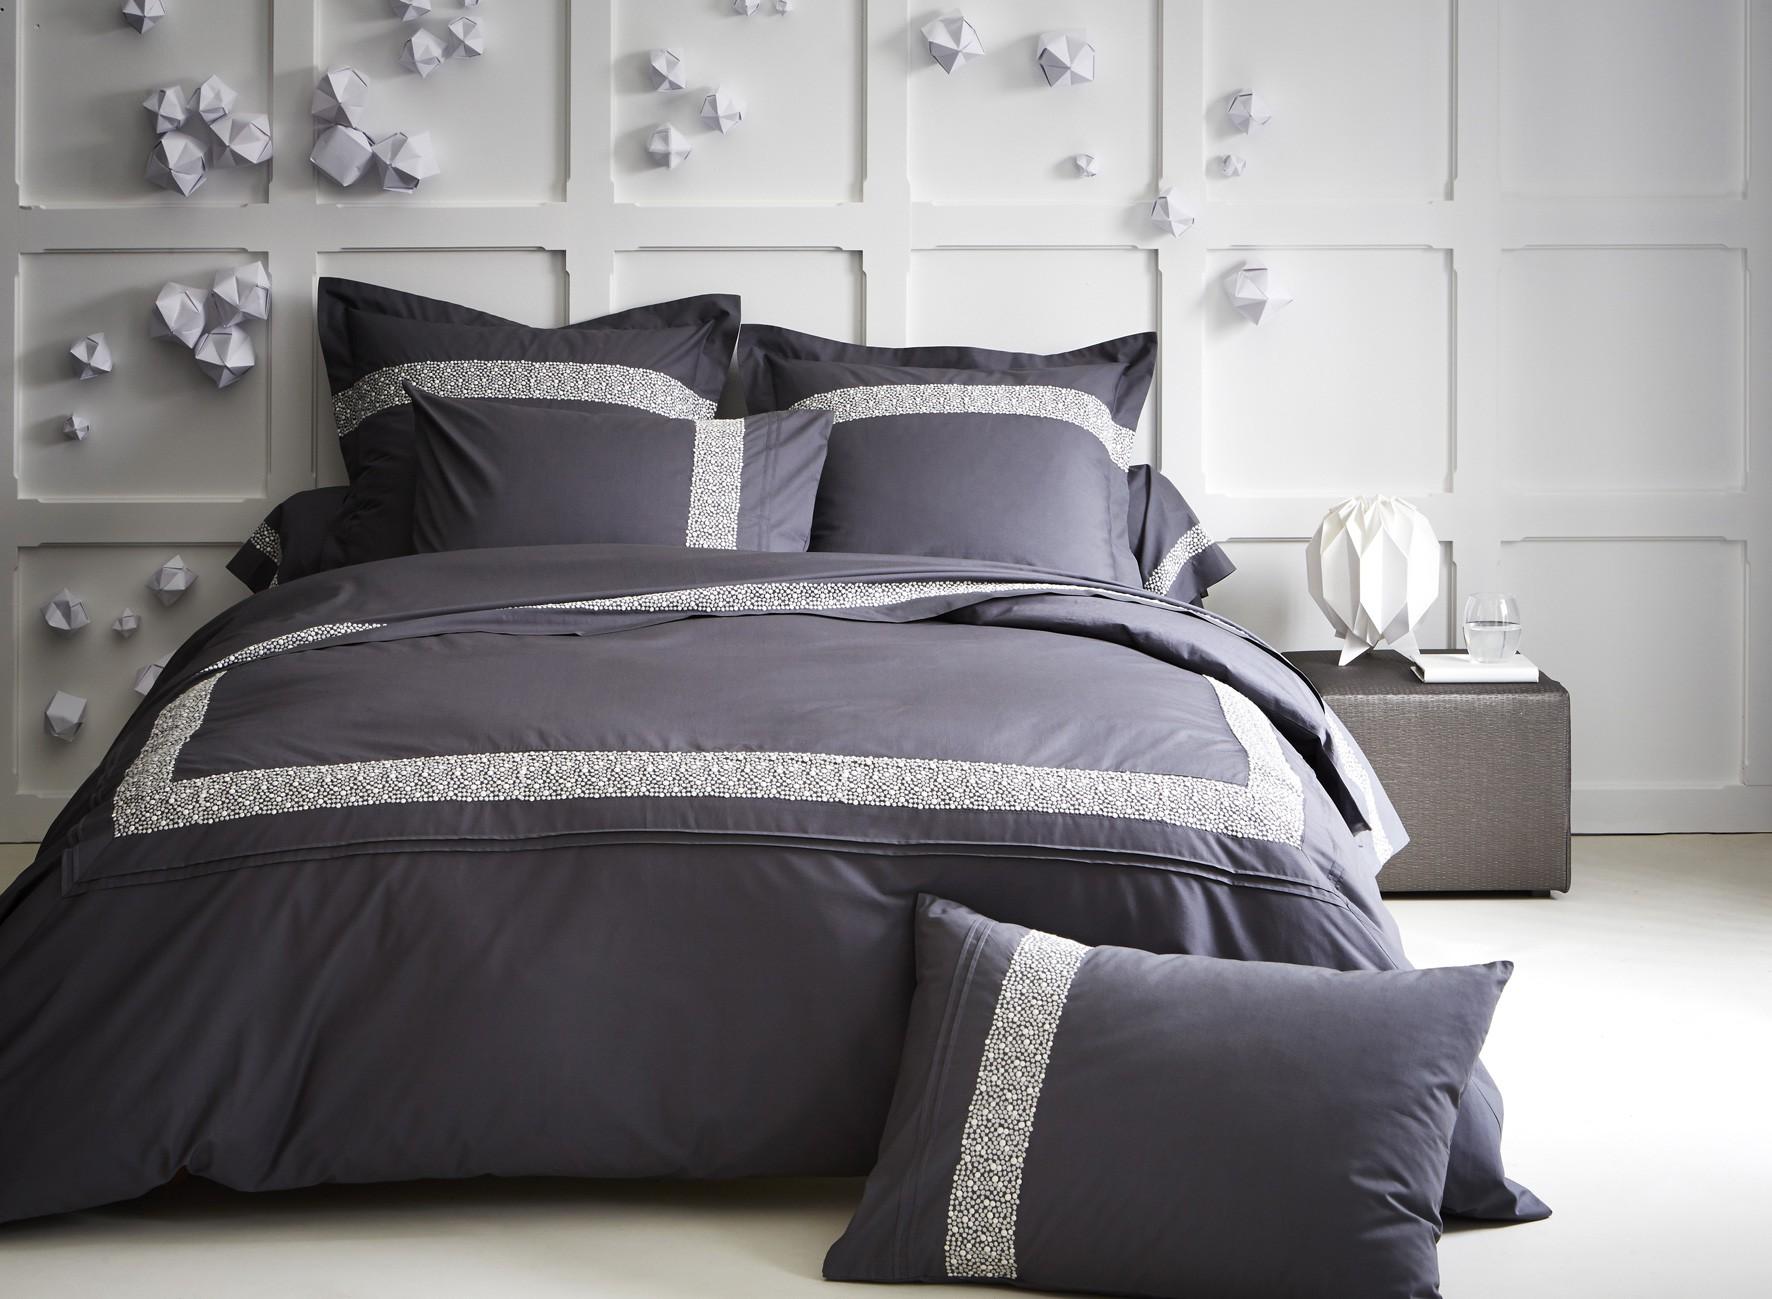 drap plat roches taille 240x300cm 270x310cm. Black Bedroom Furniture Sets. Home Design Ideas